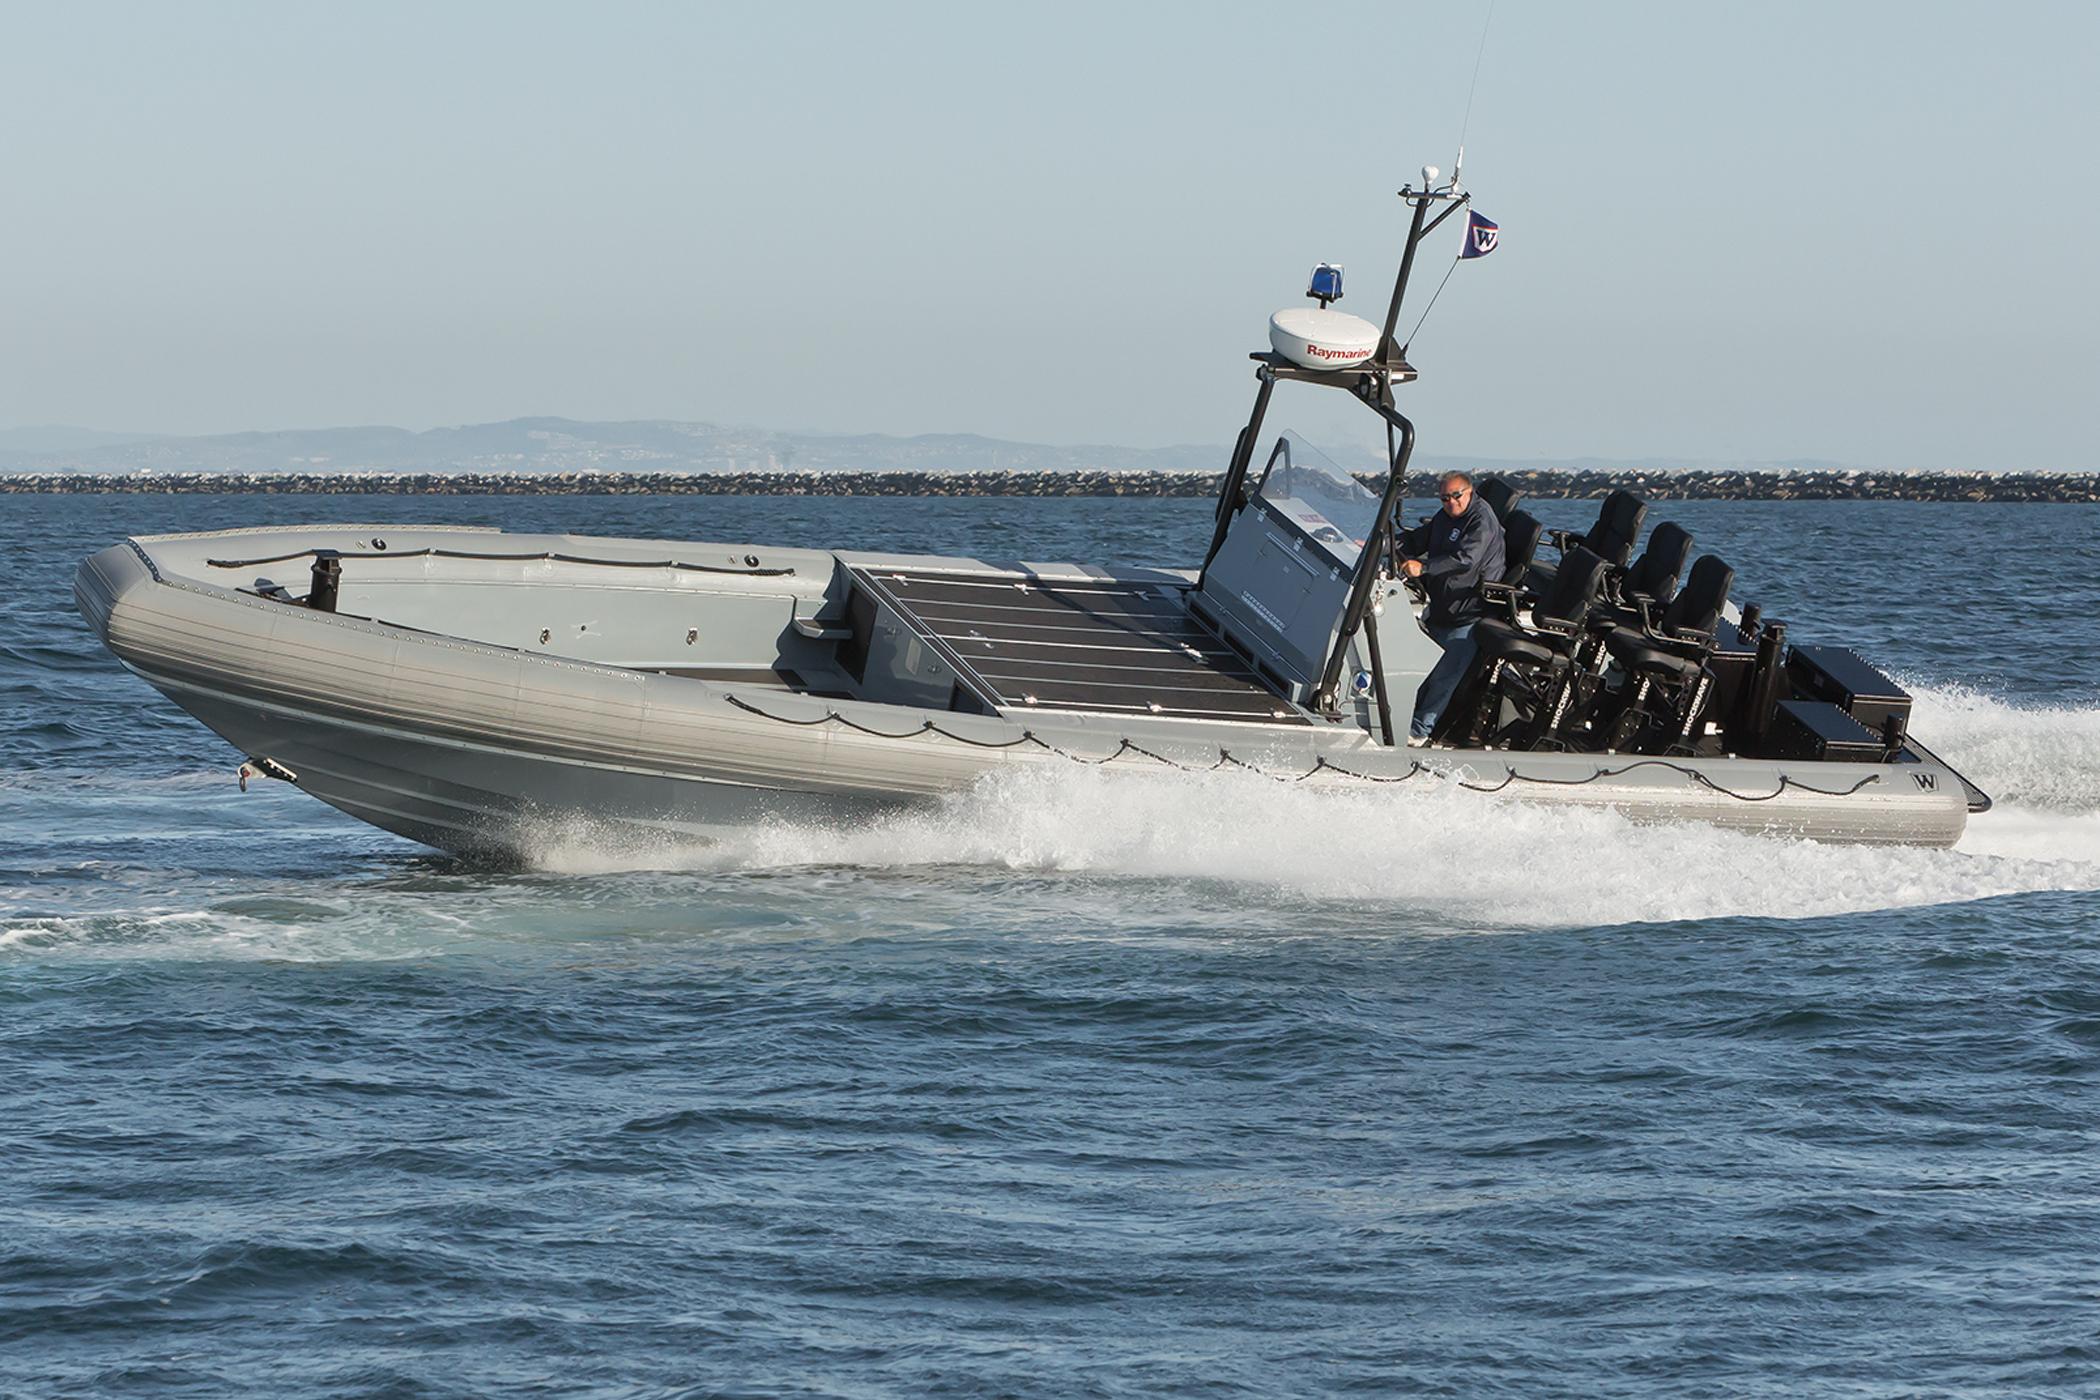 Willard marine to supply aluminum patrol boats for ukranian navy under foreign military sales program